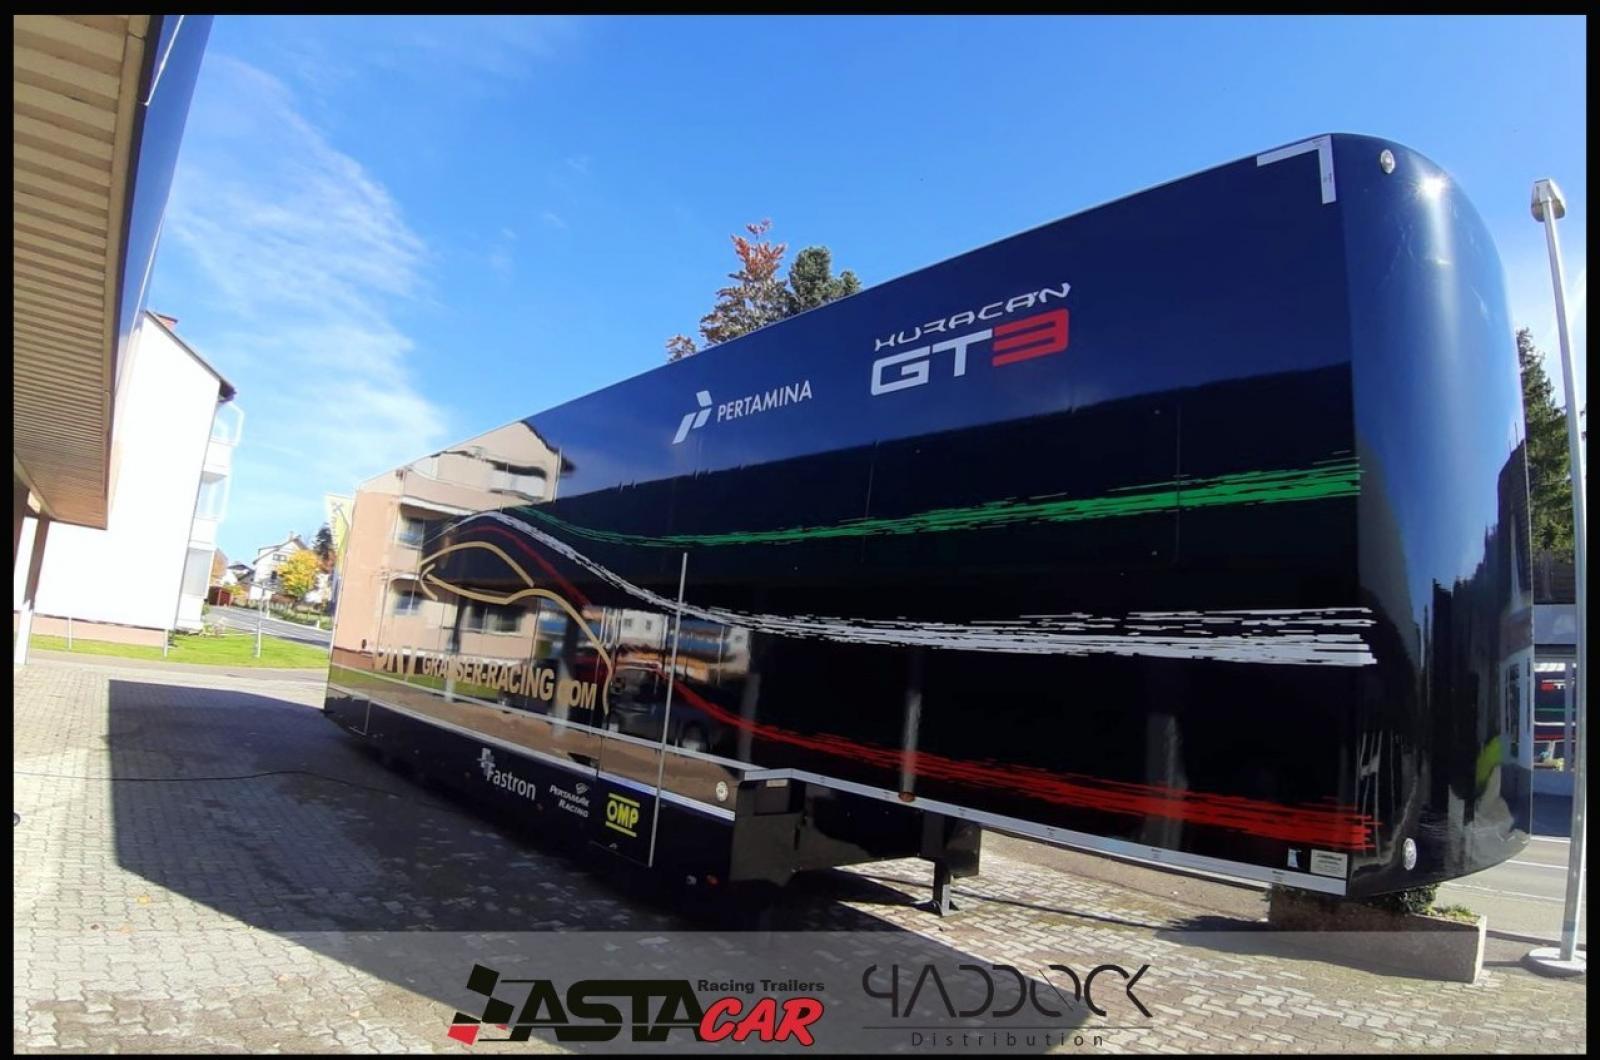 USED TRAILER ASTA CAR Y2 BY PADDOCK DISTRIBUTION - 2